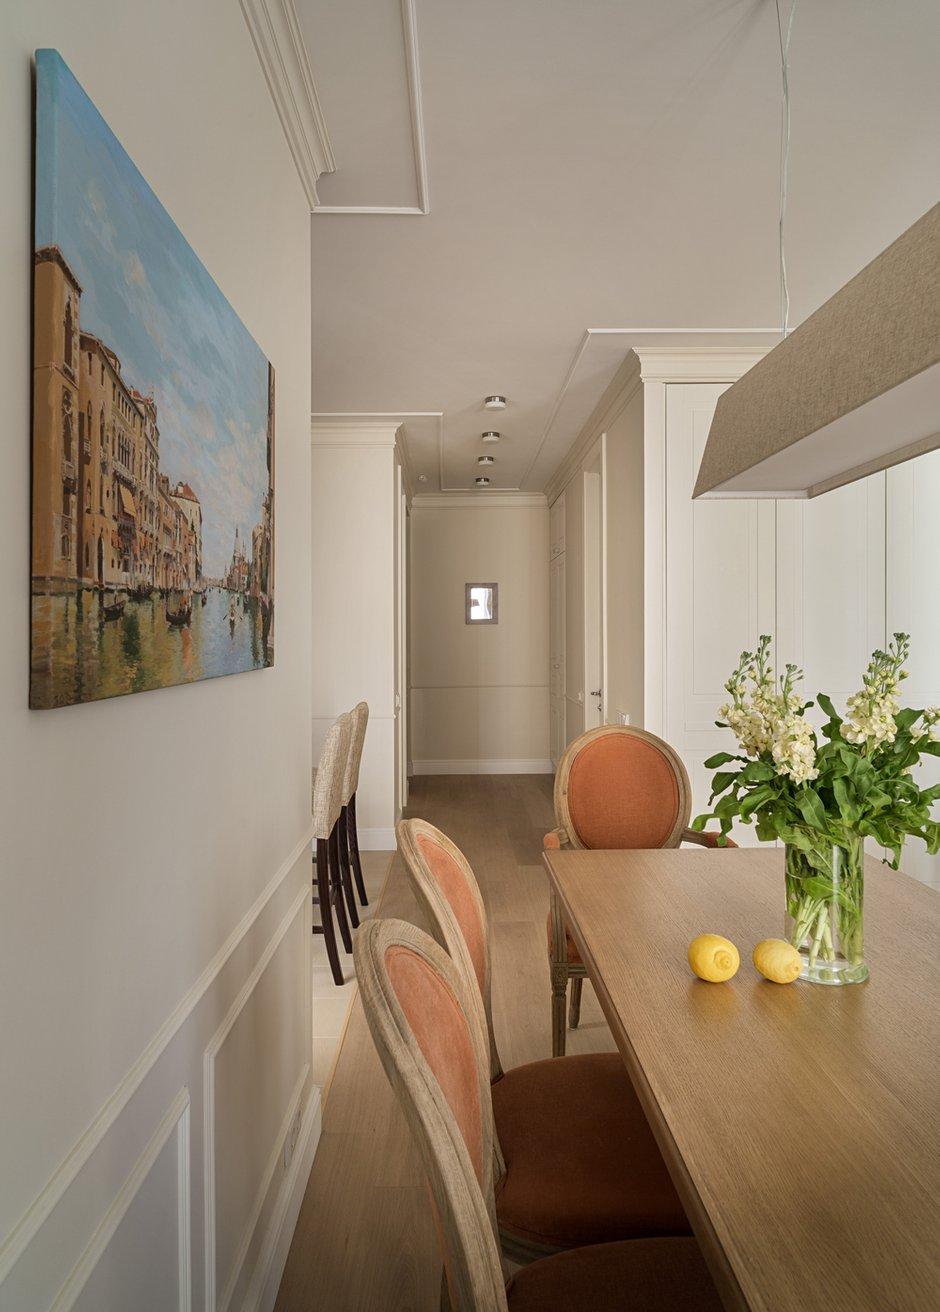 Фотография: Кухня и столовая в стиле Прованс и Кантри, Квартира, Дома и квартиры, Проект недели, Москва – фото на INMYROOM